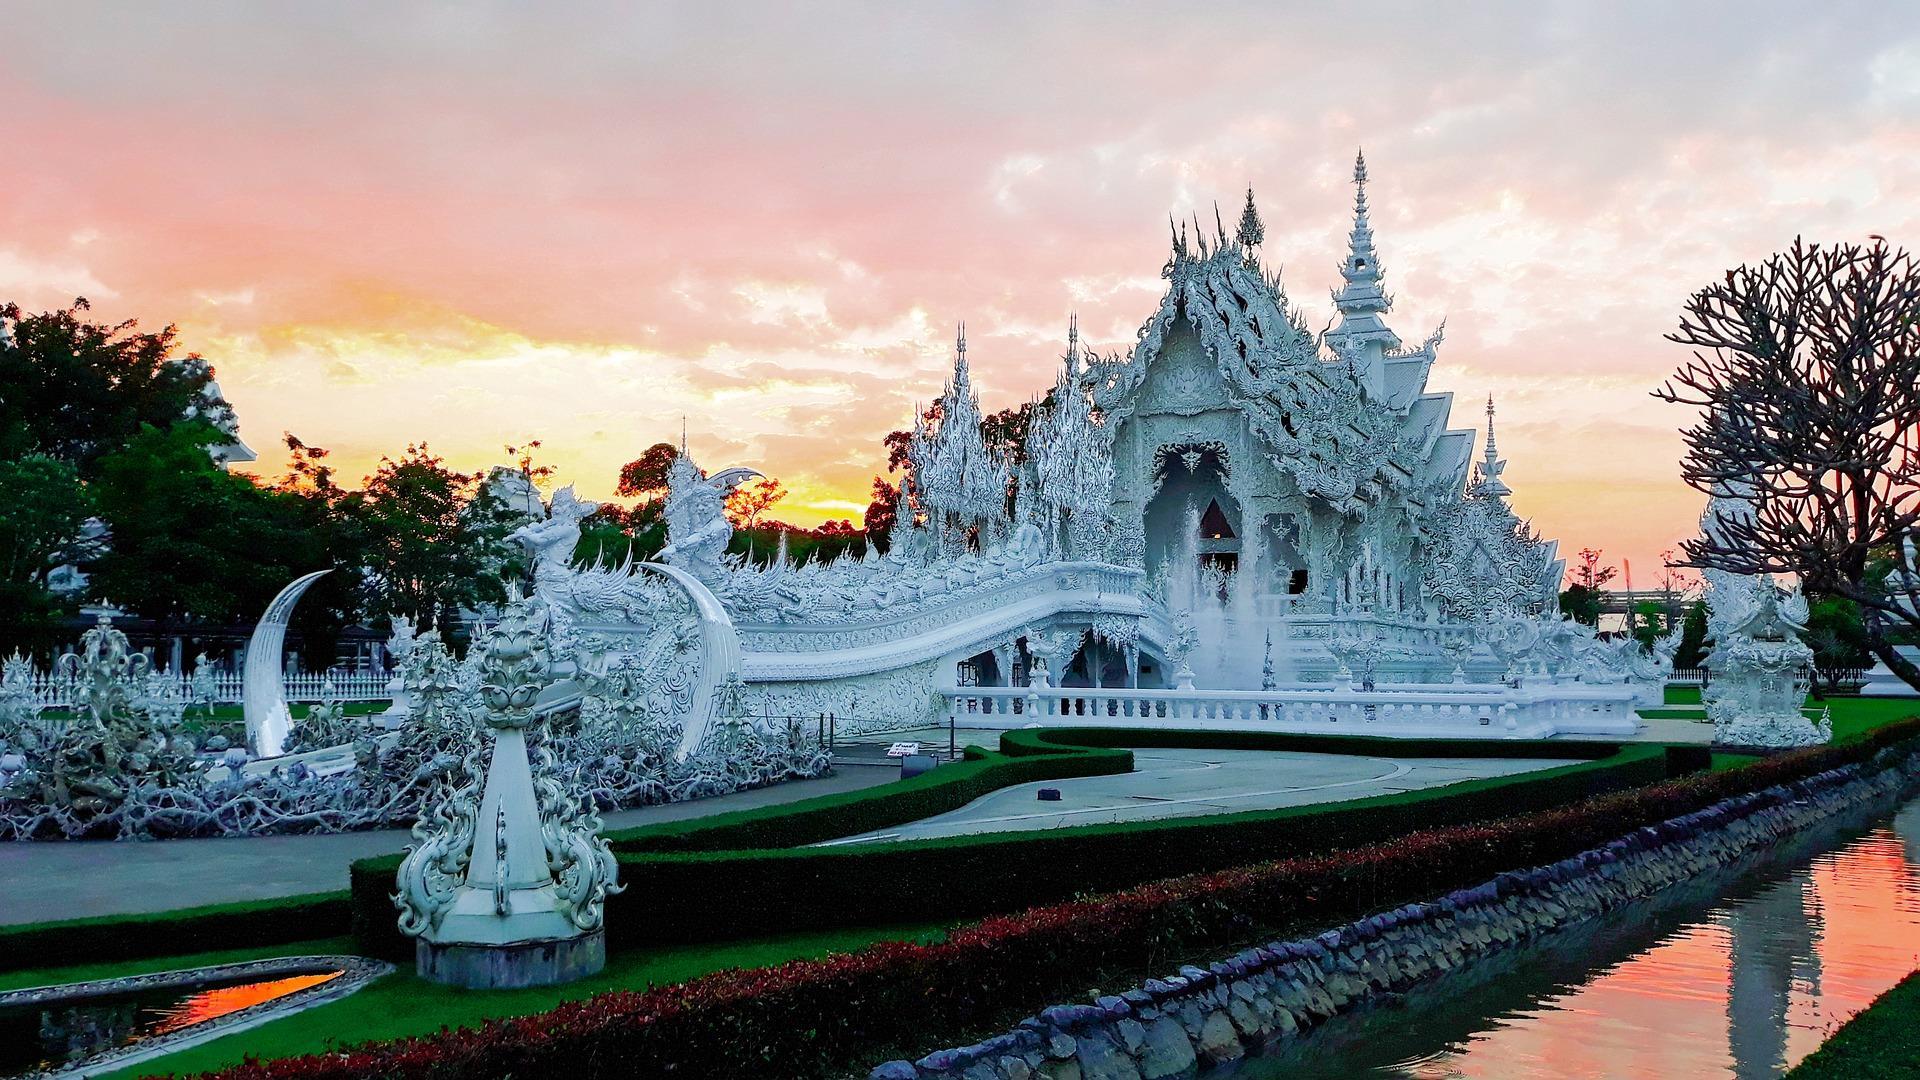 /optitravel/online/www/layout22/single_product.php?pkt_id=252&Produto=Tailândia Clássica & Koh Samui&destino=TAILÂNDIA